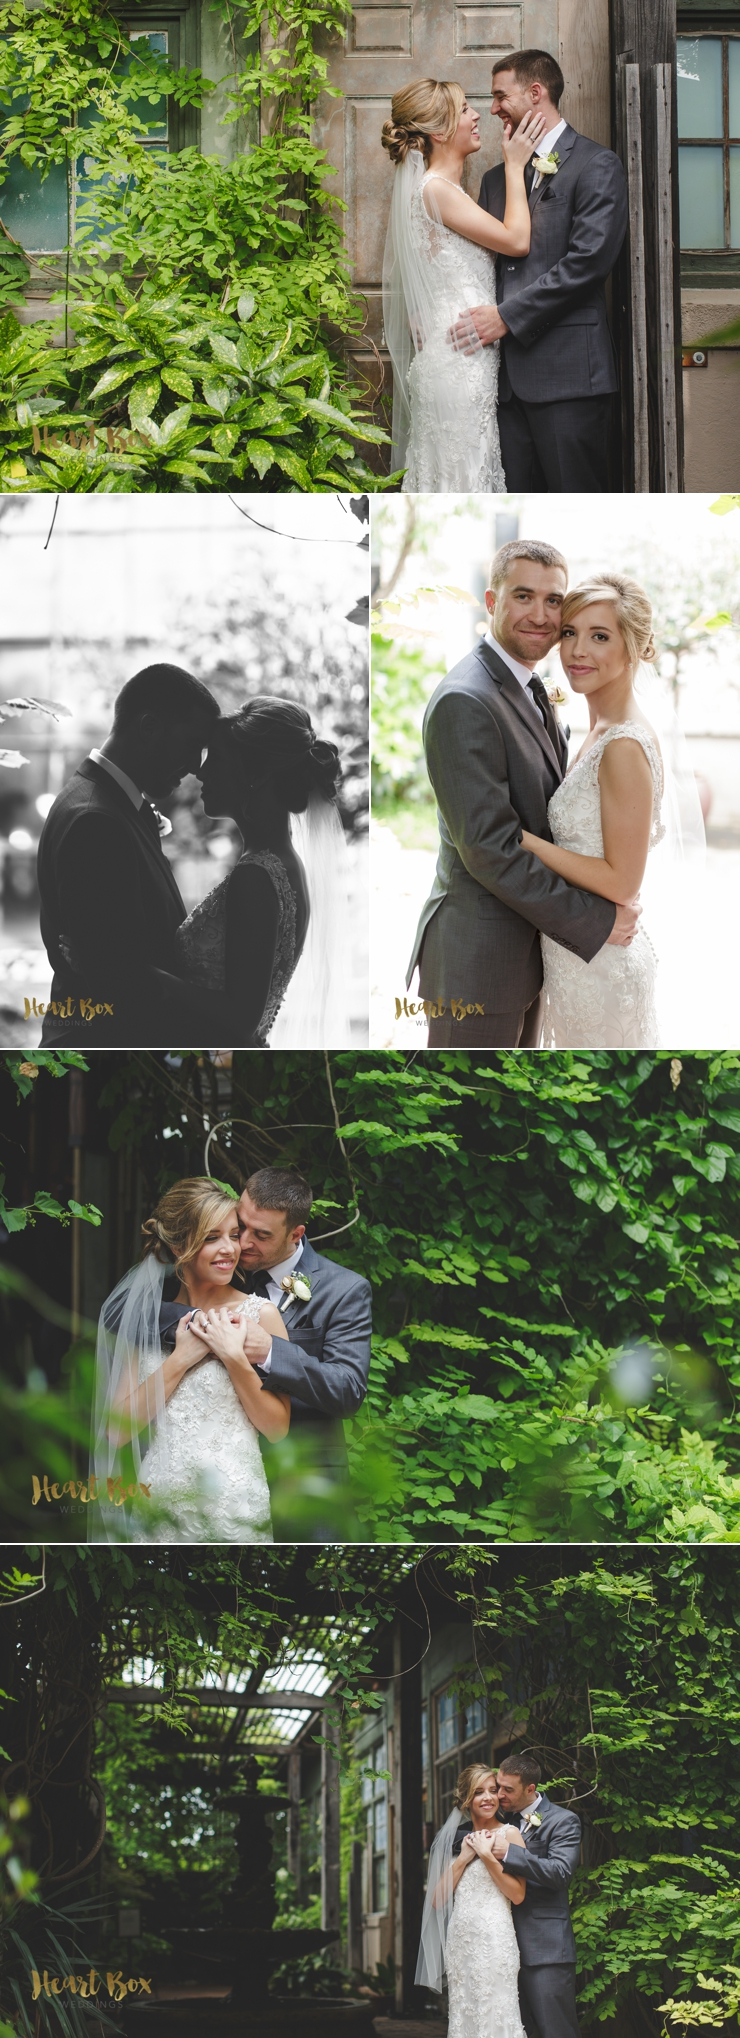 Popplewell Wedding Blog Collages 15.jpg